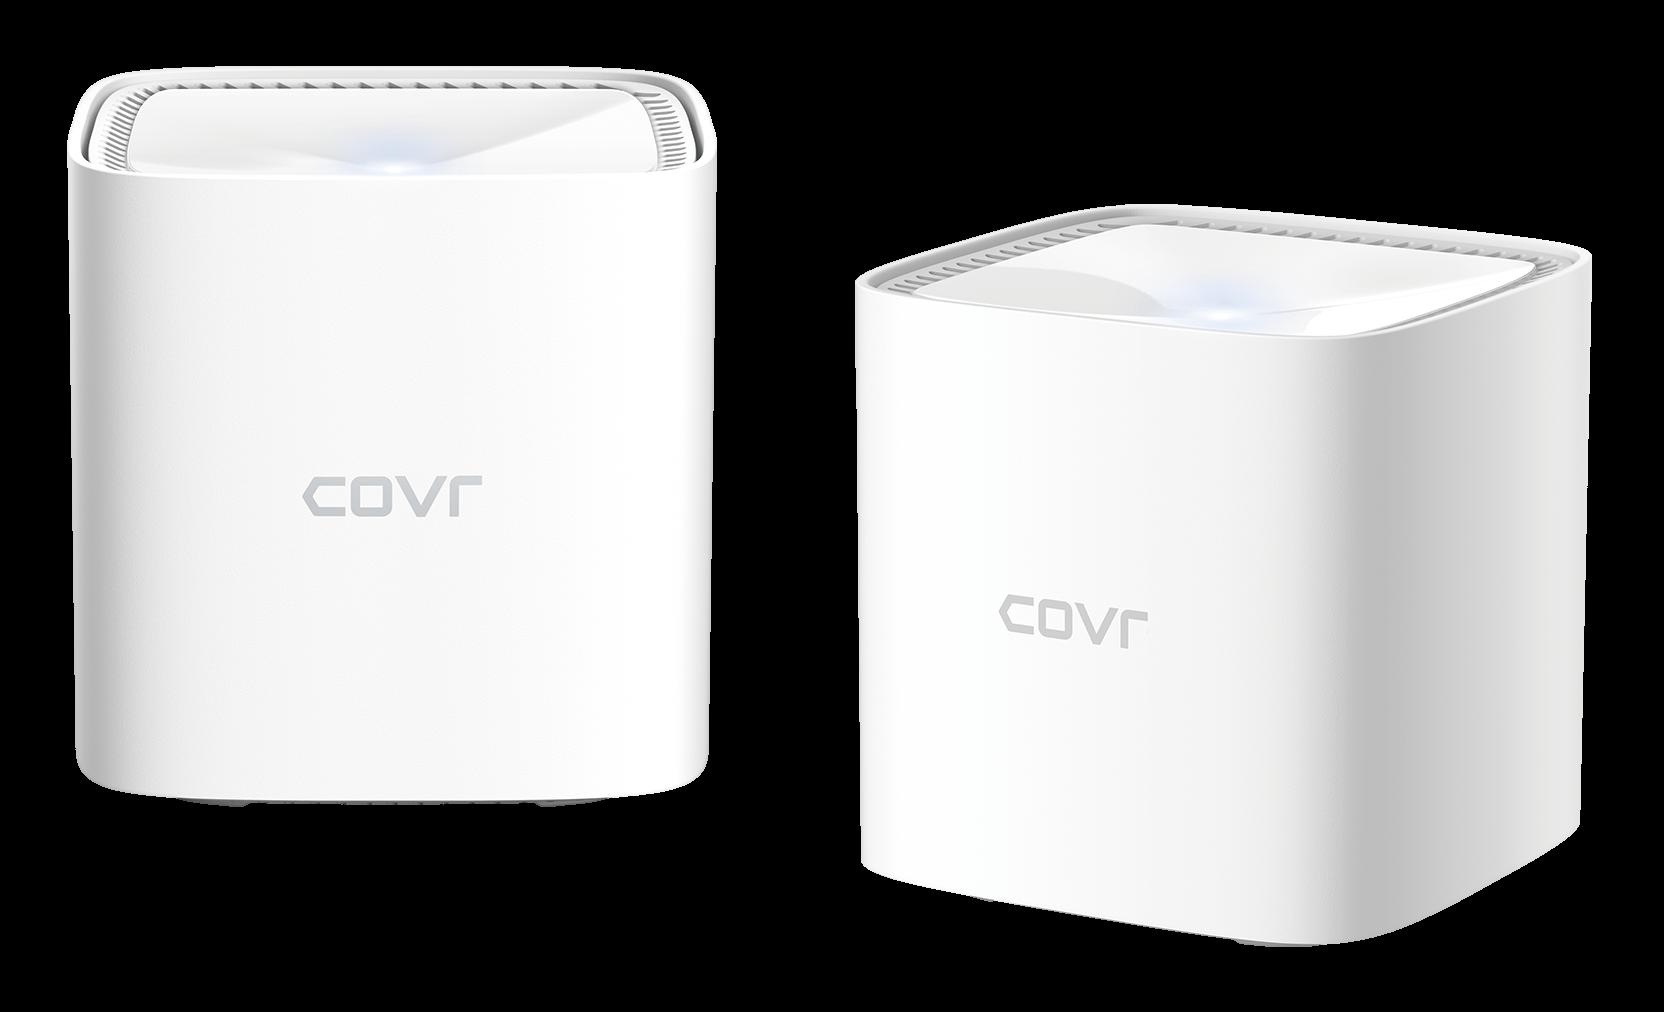 D-Link COVR-1102/E AC1200 Dual Band Whole Home Mesh Wi-Fi System - COVR-1102/E